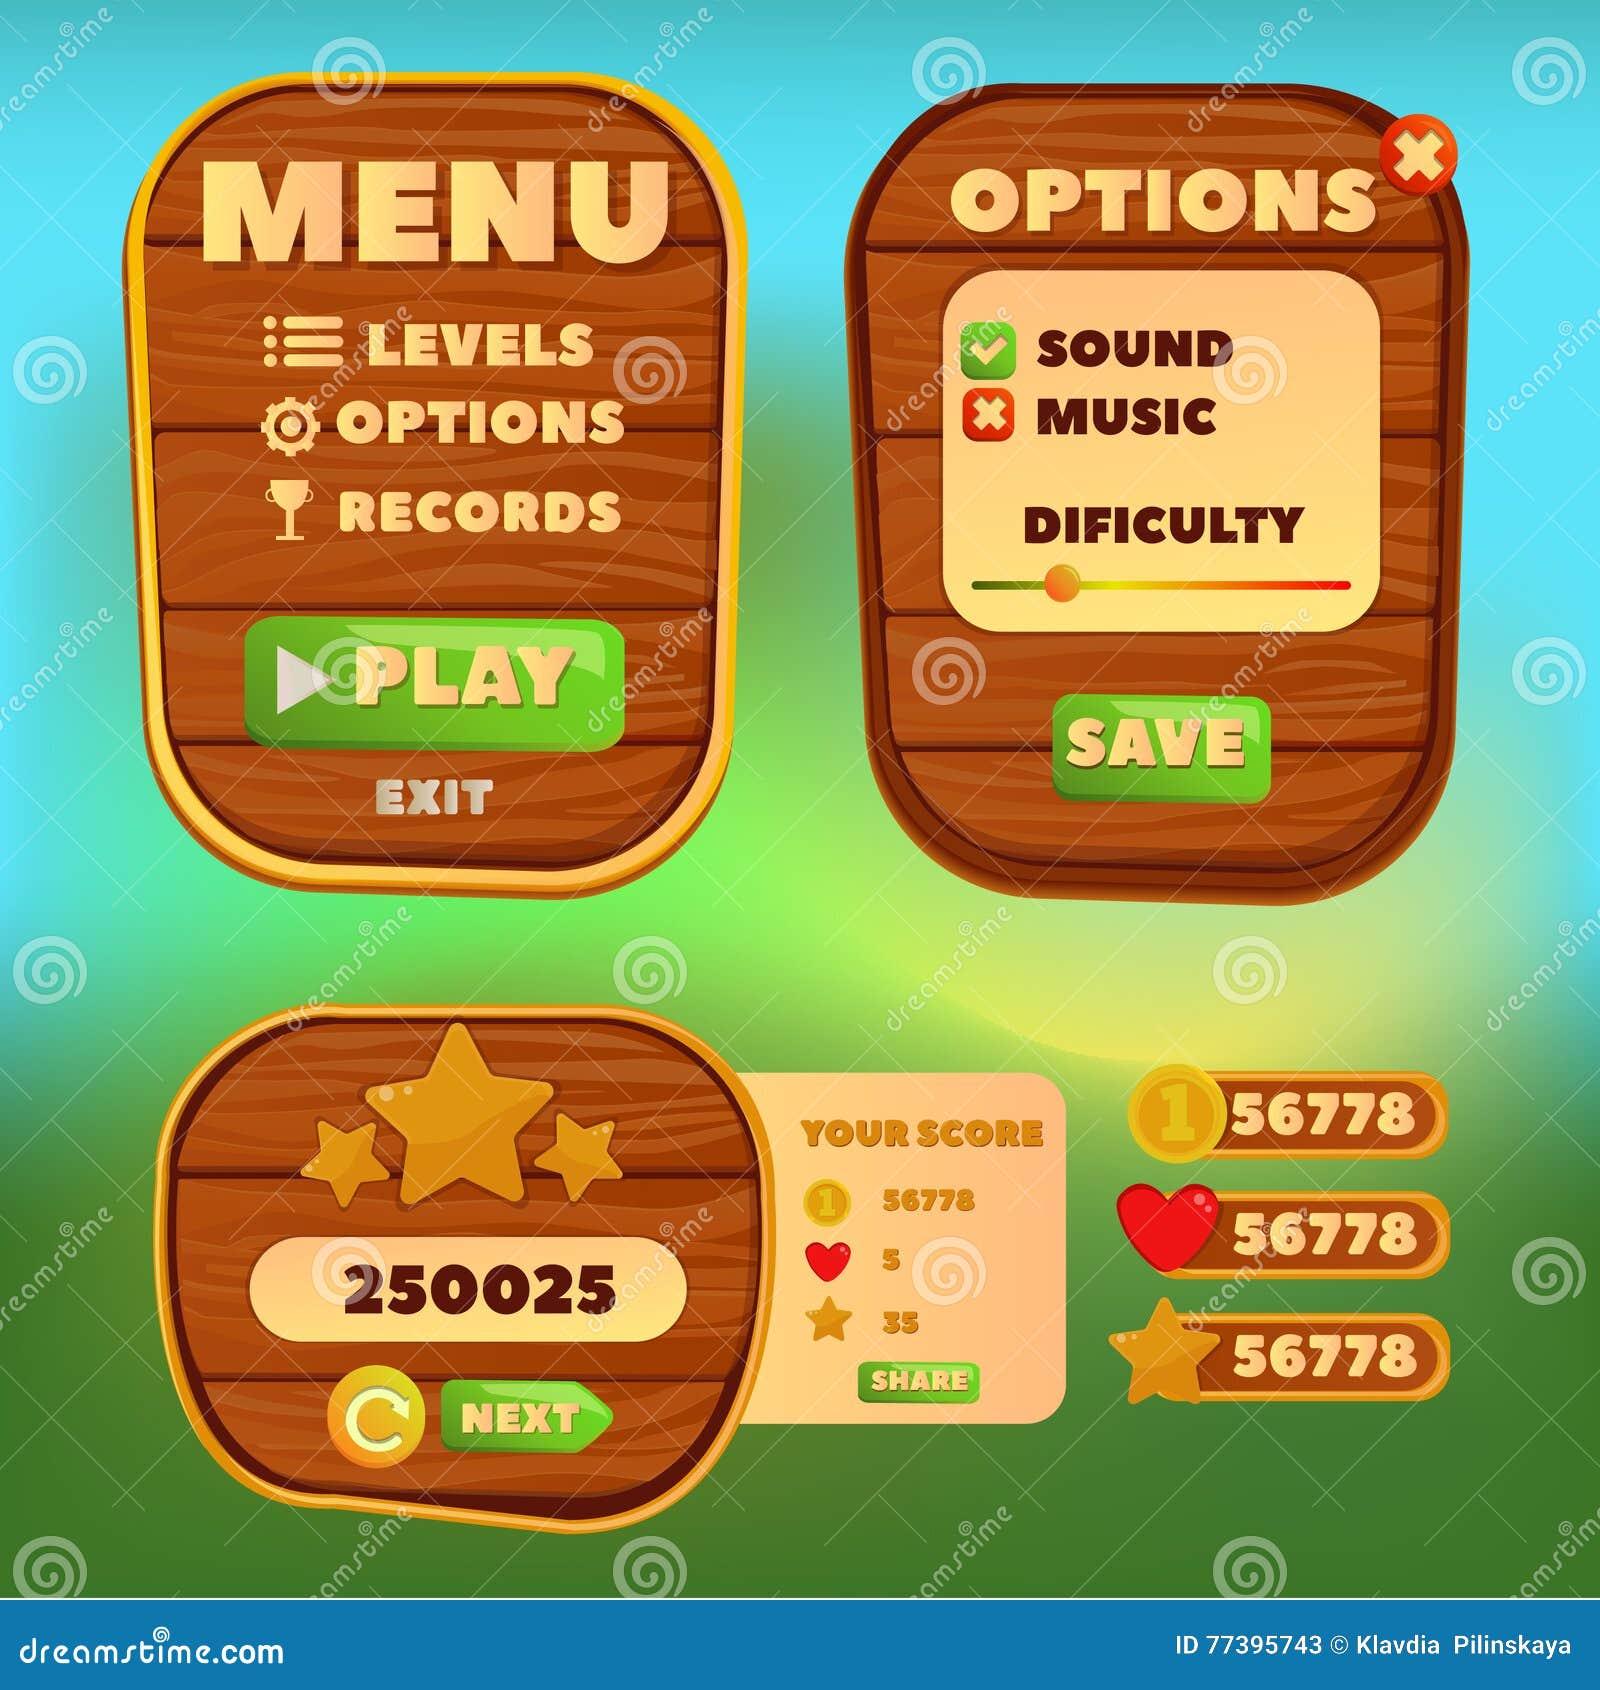 Cartoon Wood Control Panel For Ui Game Menu Elements Of A Funny - Game menu design